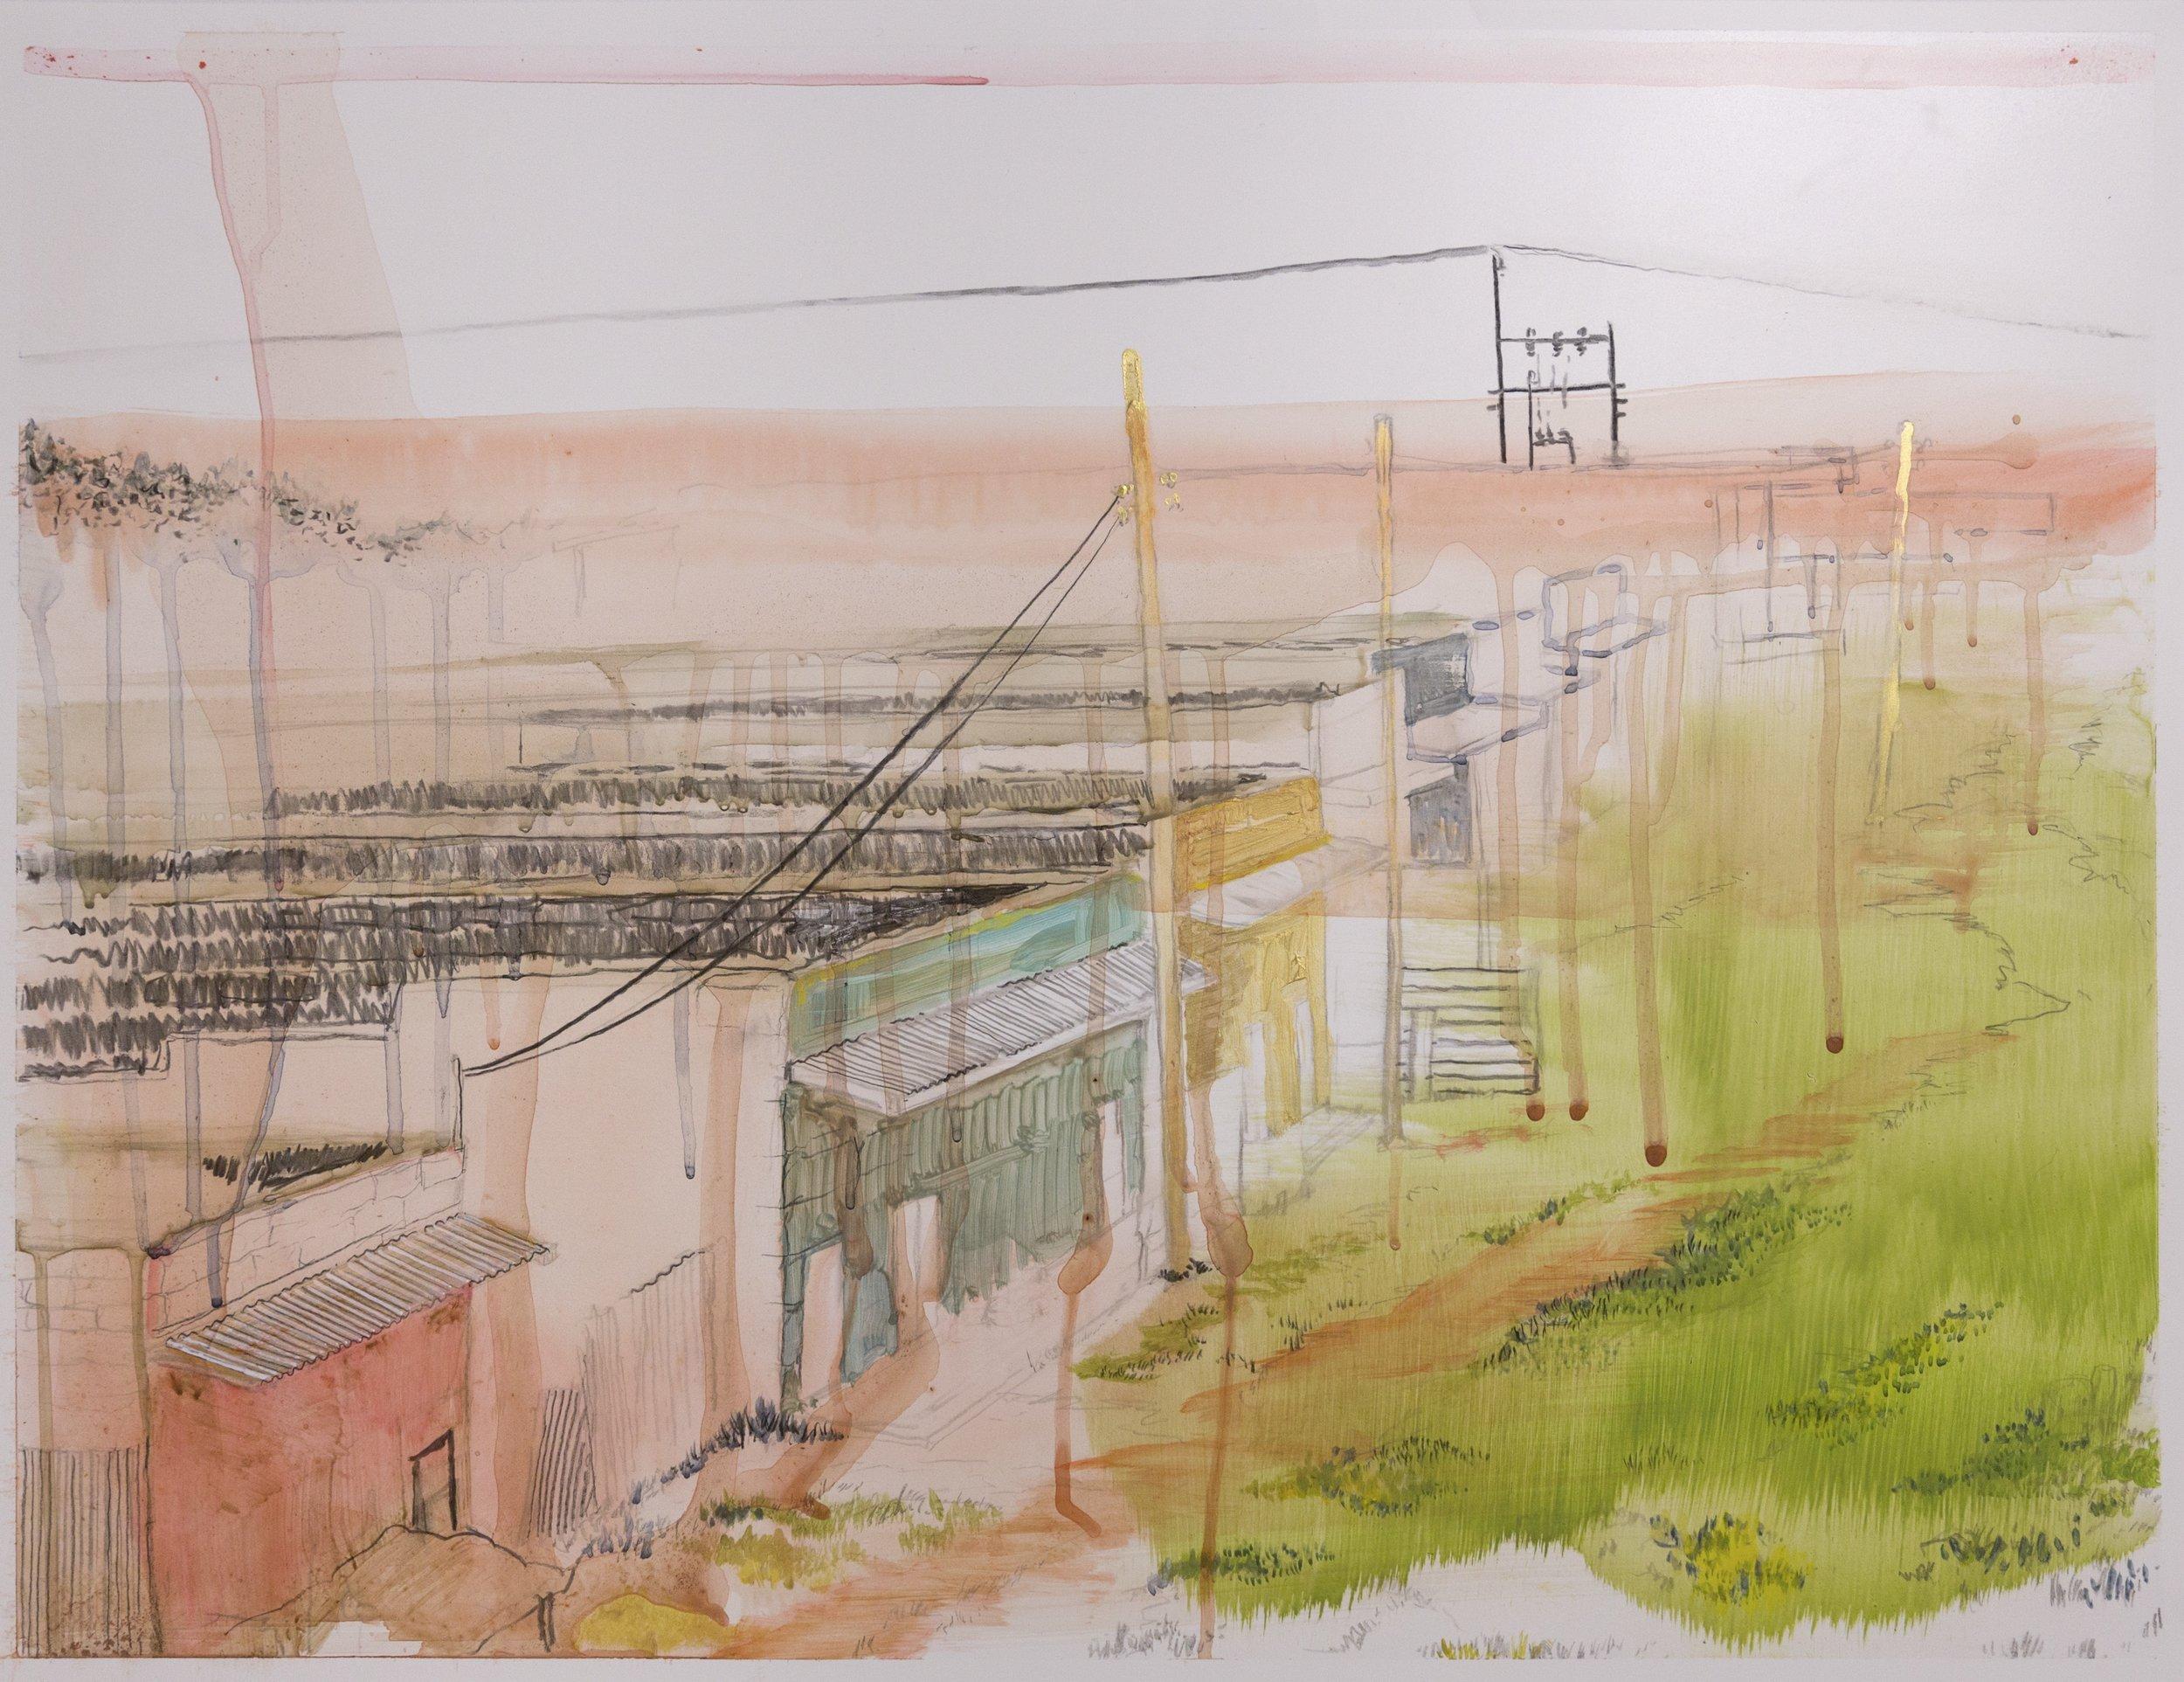 "Storefronts near Lari Hills, 2016, acrylic on paper, 20"" x 26"""